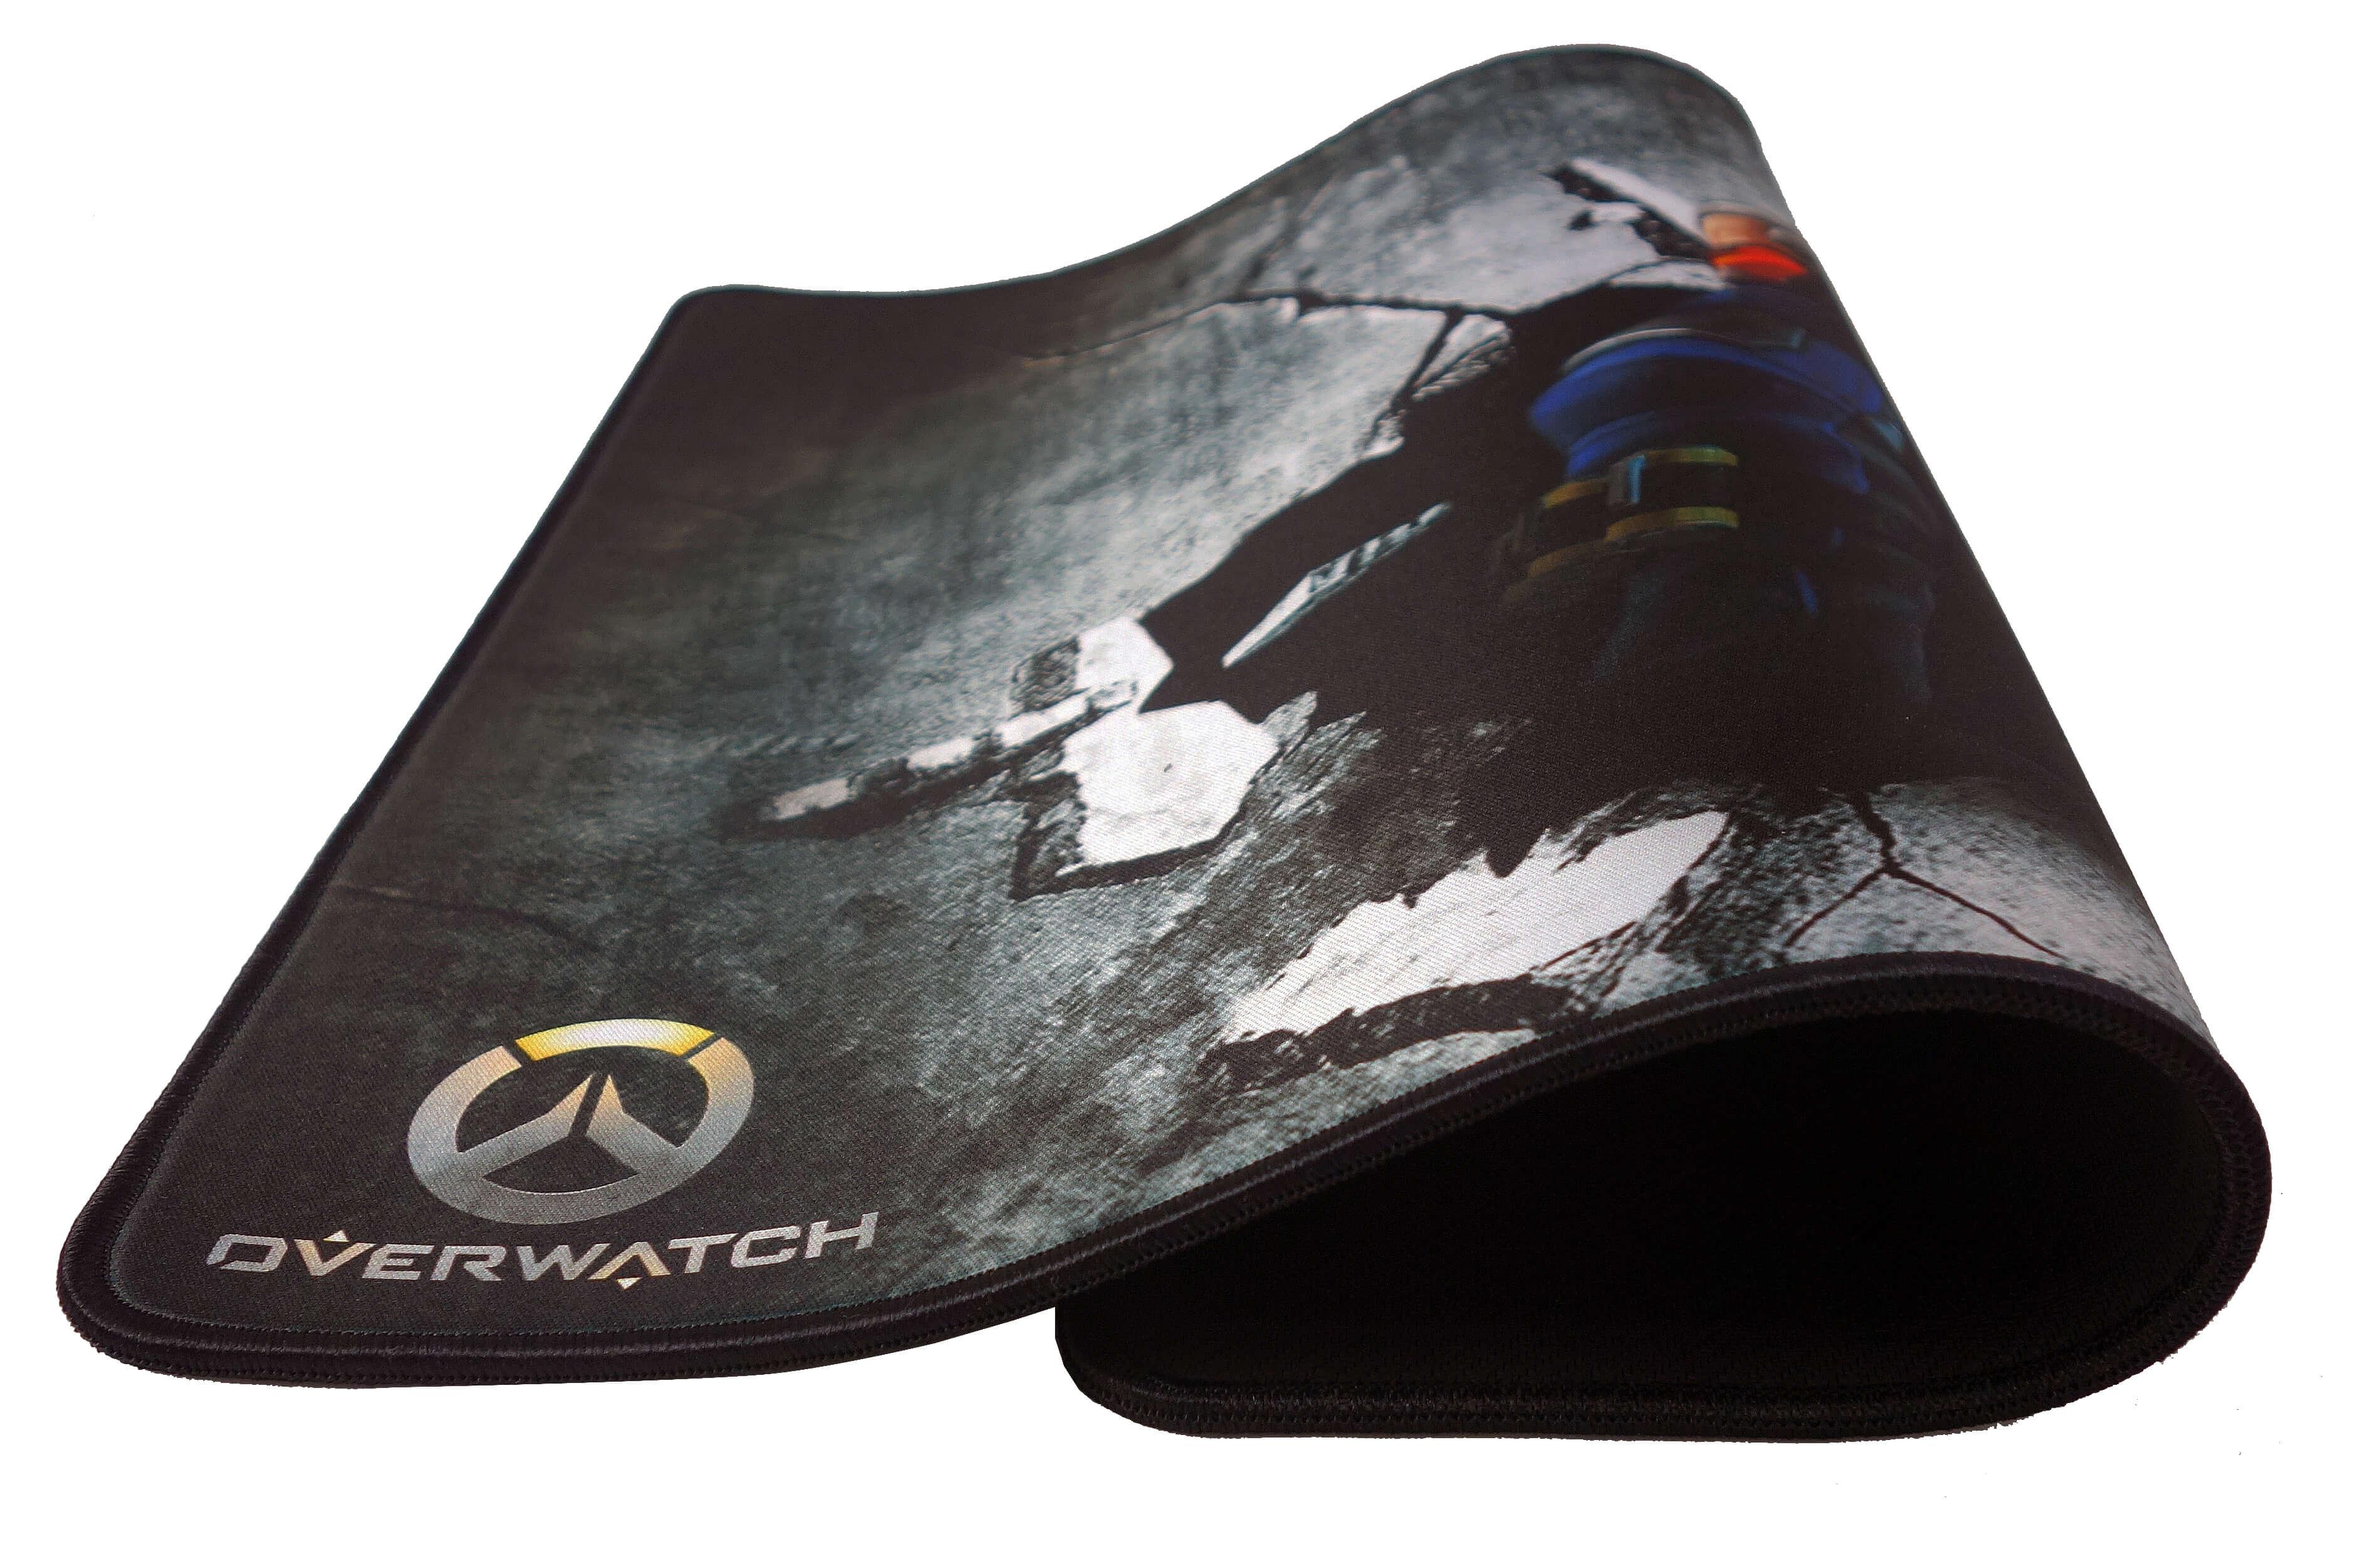 Геймърска подложка за мишка Overwatch L